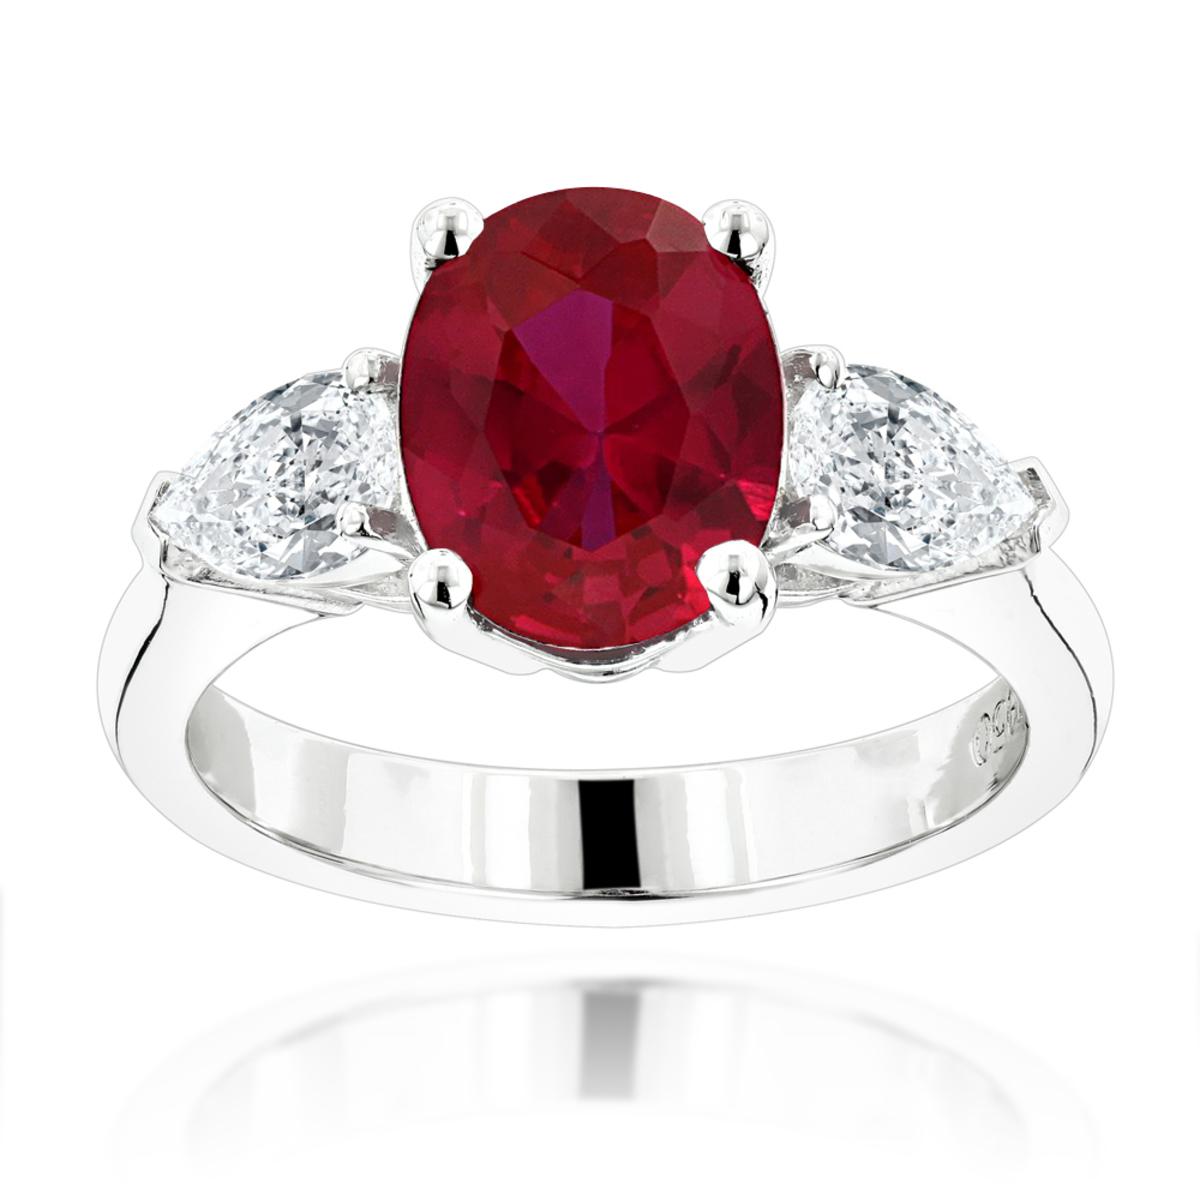 Unique 3 Stone Platinum Diamond and Ruby Engagement Ring